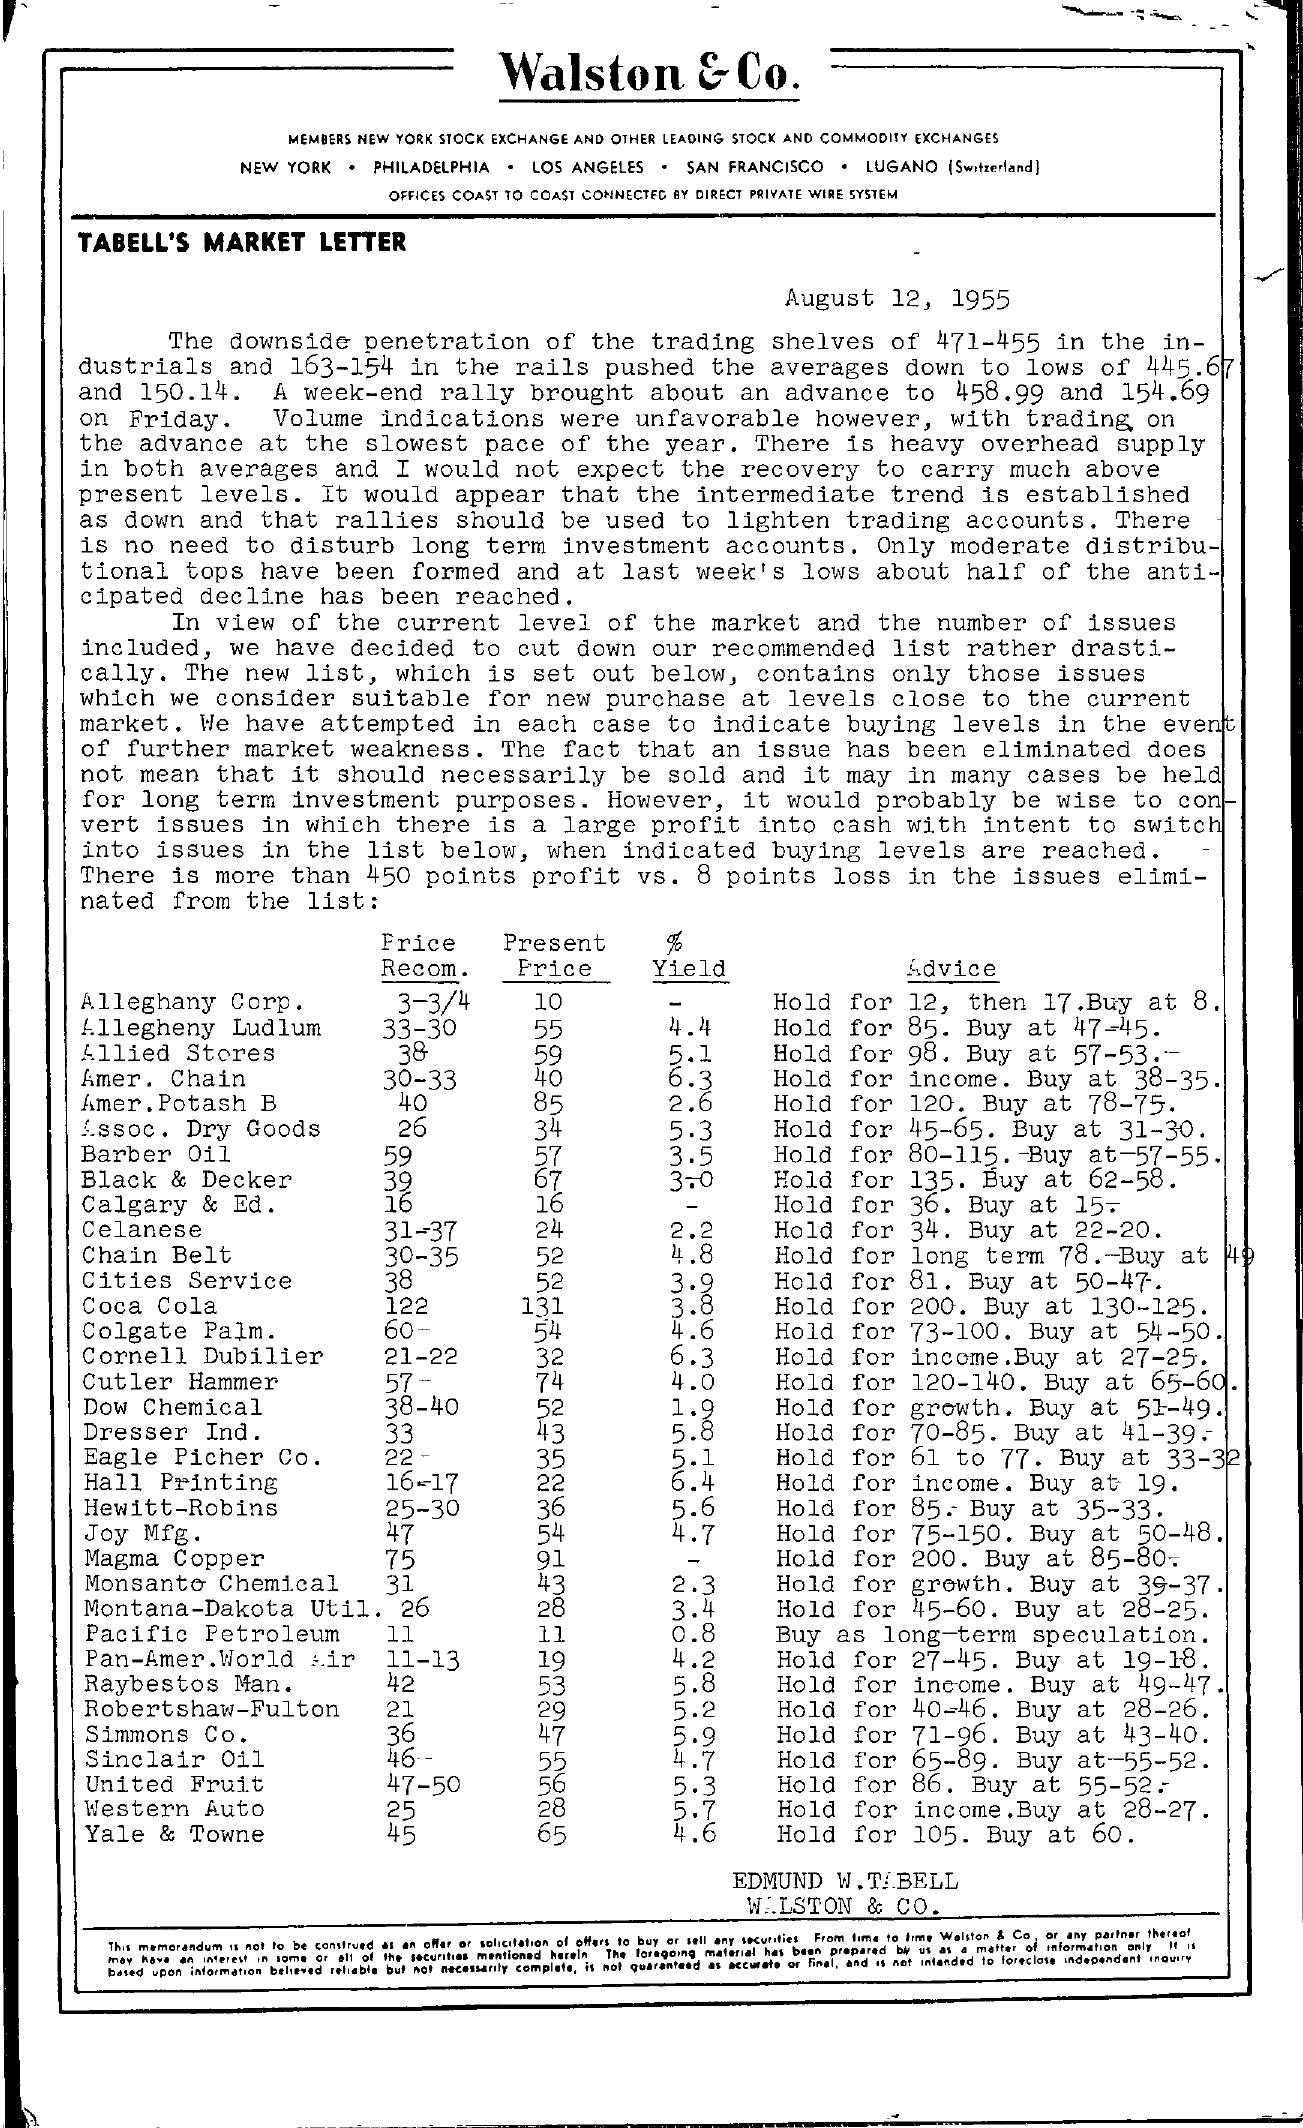 Tabell's Market Letter - August 12, 1955